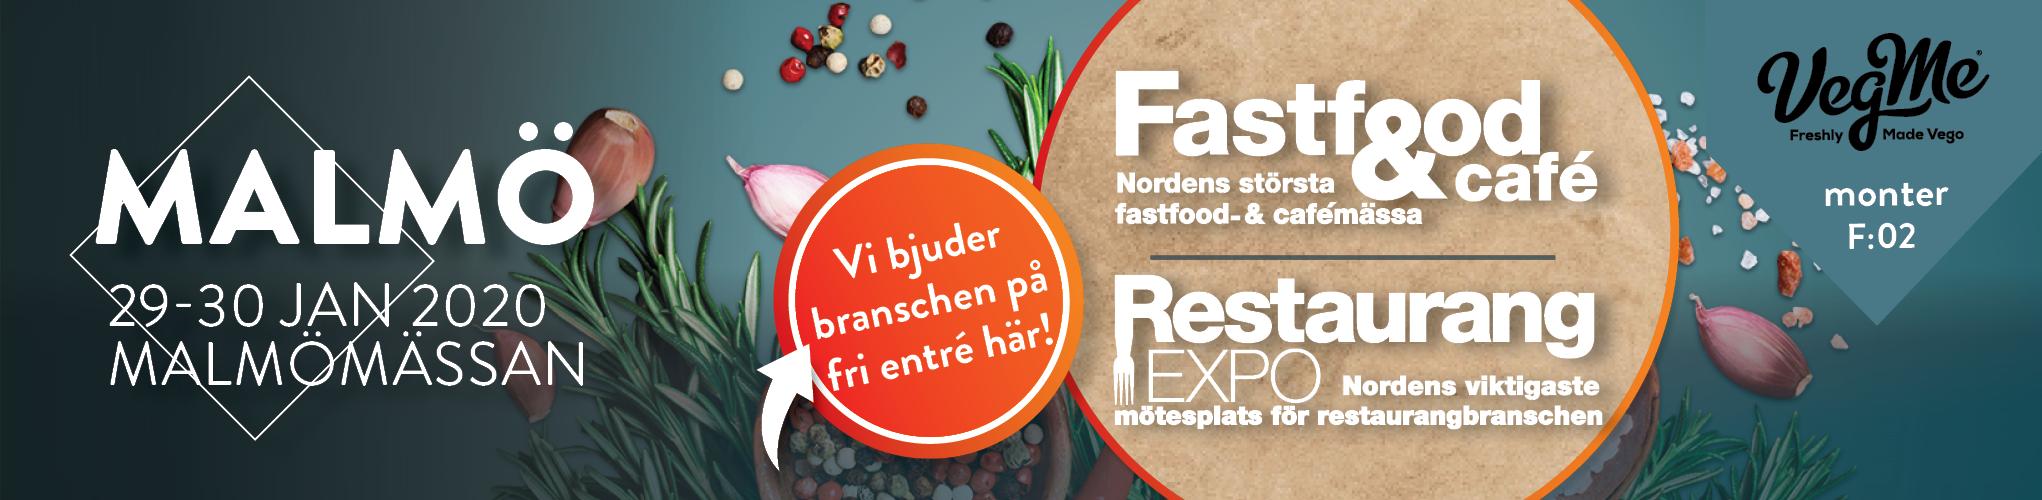 VegMe på Fastfood & Cafémässan 29-30 jan 2020